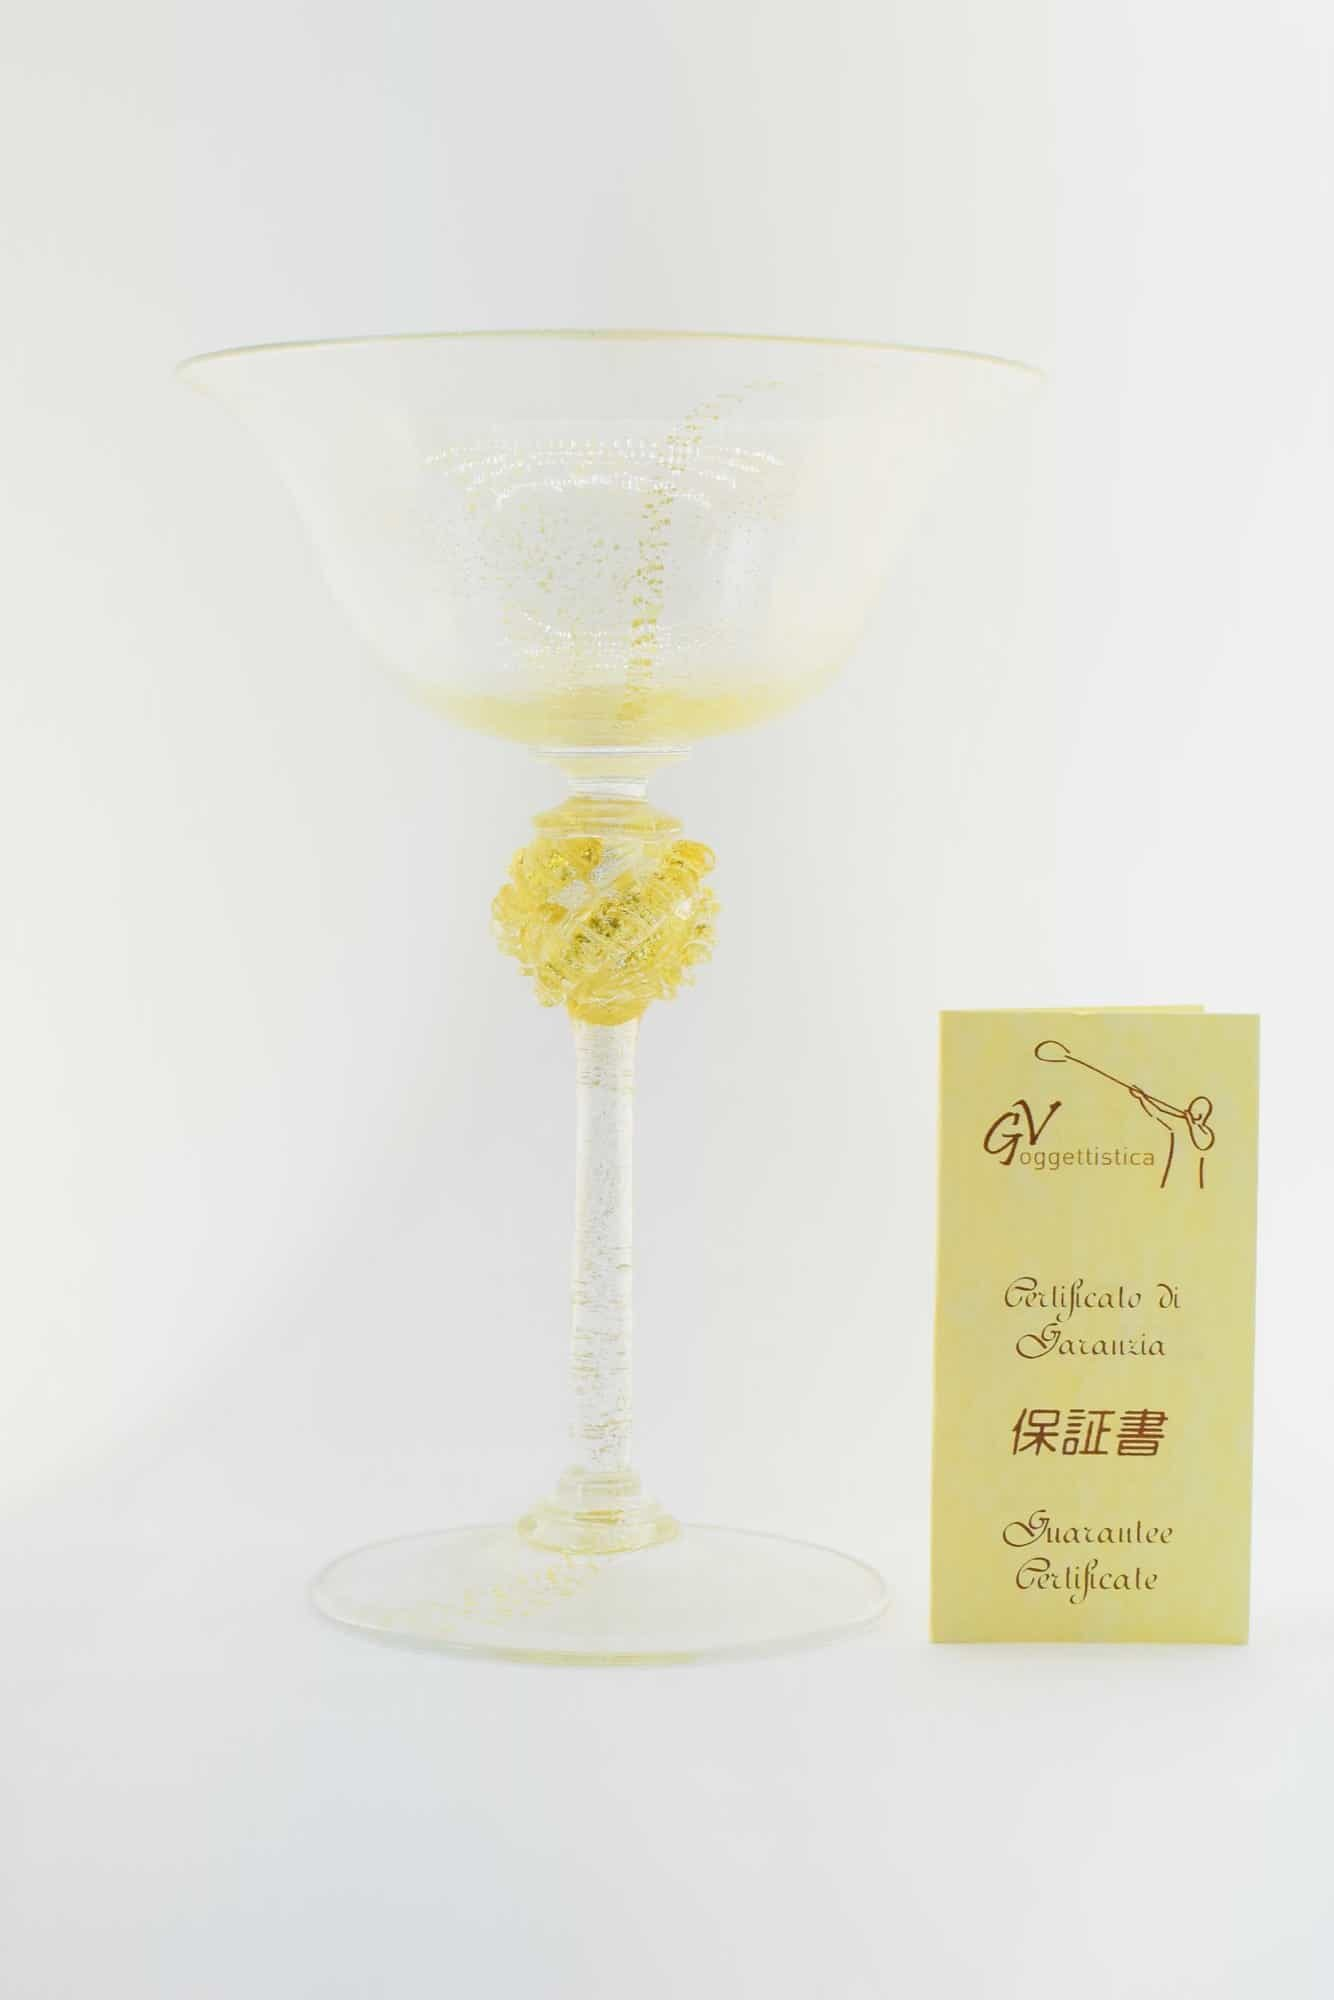 Murano Glass Sammlerbecher (Art. 36674)